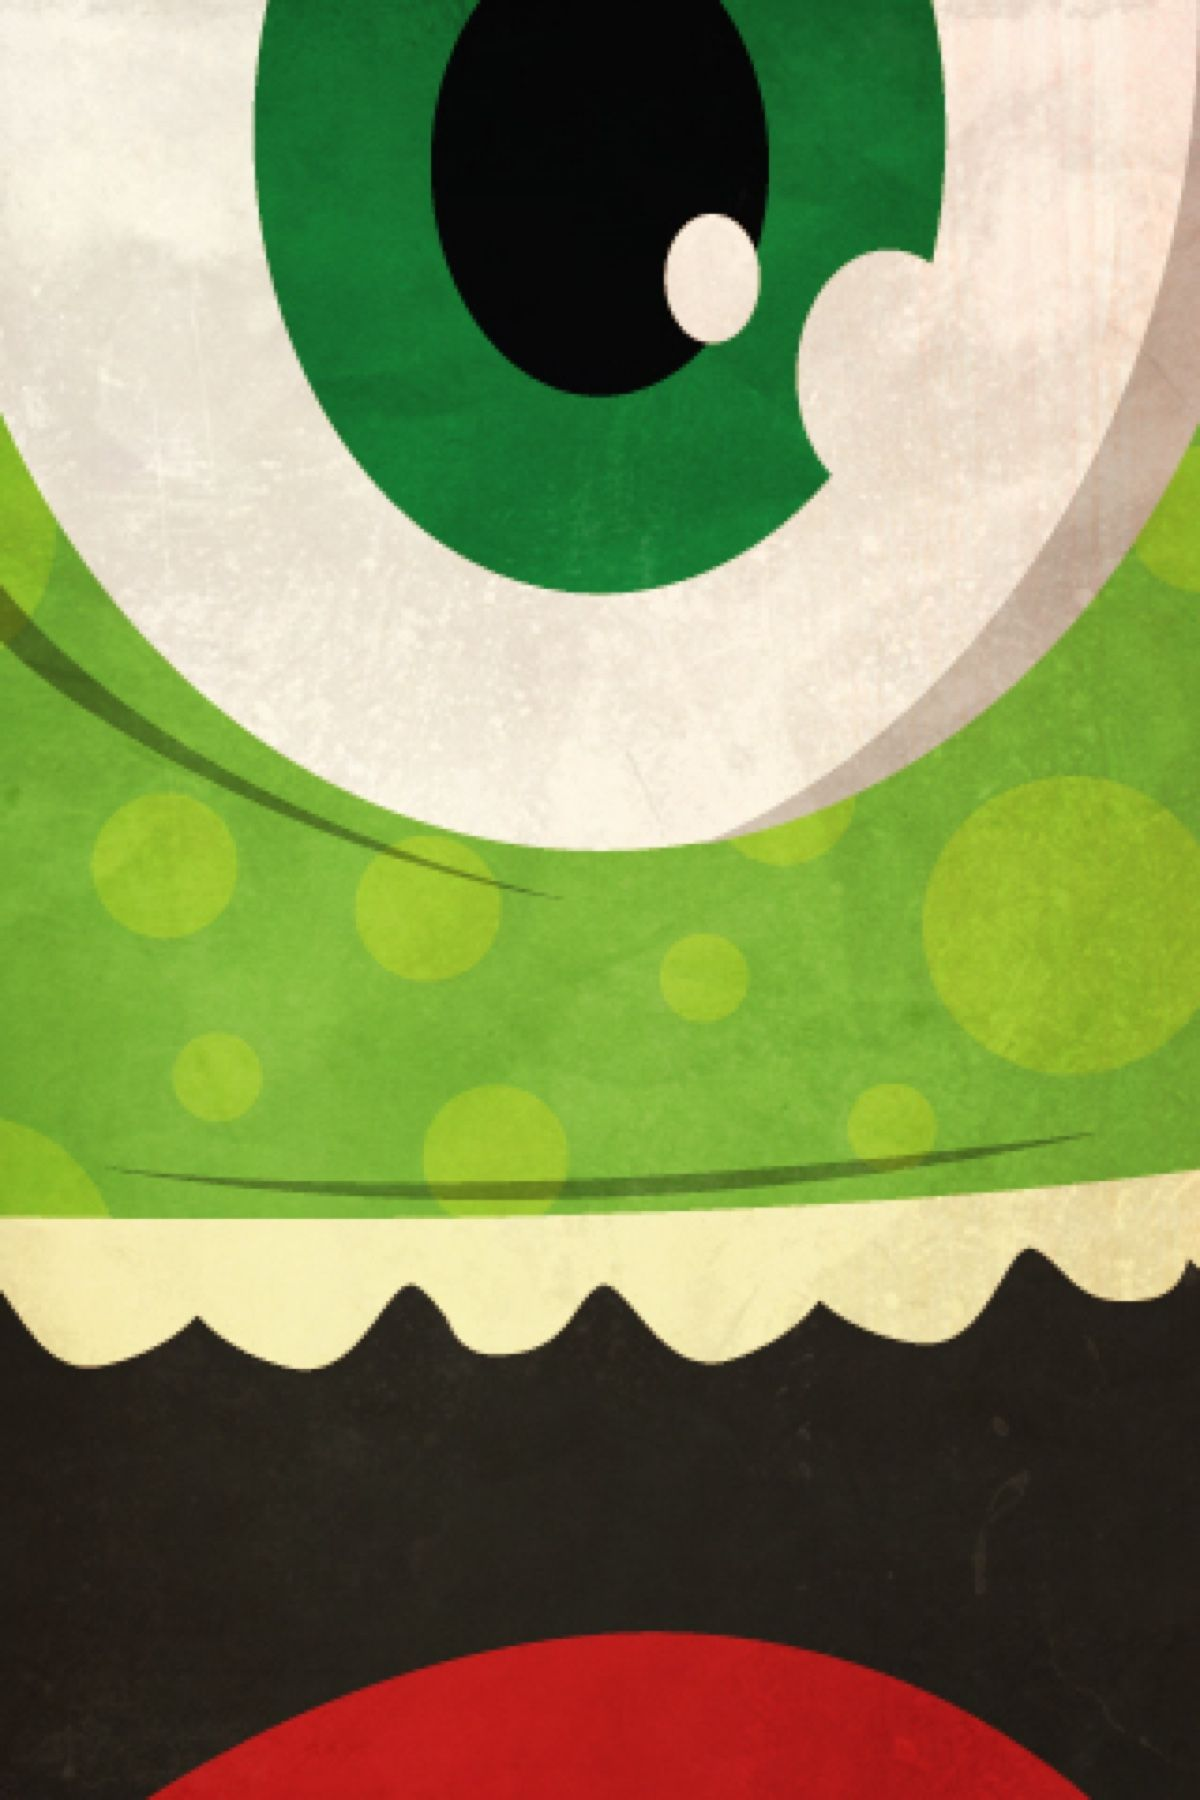 Wallpaper iphone disney tumblr - Wallpapers Tumblr Iphone Disney Buscar Con Google